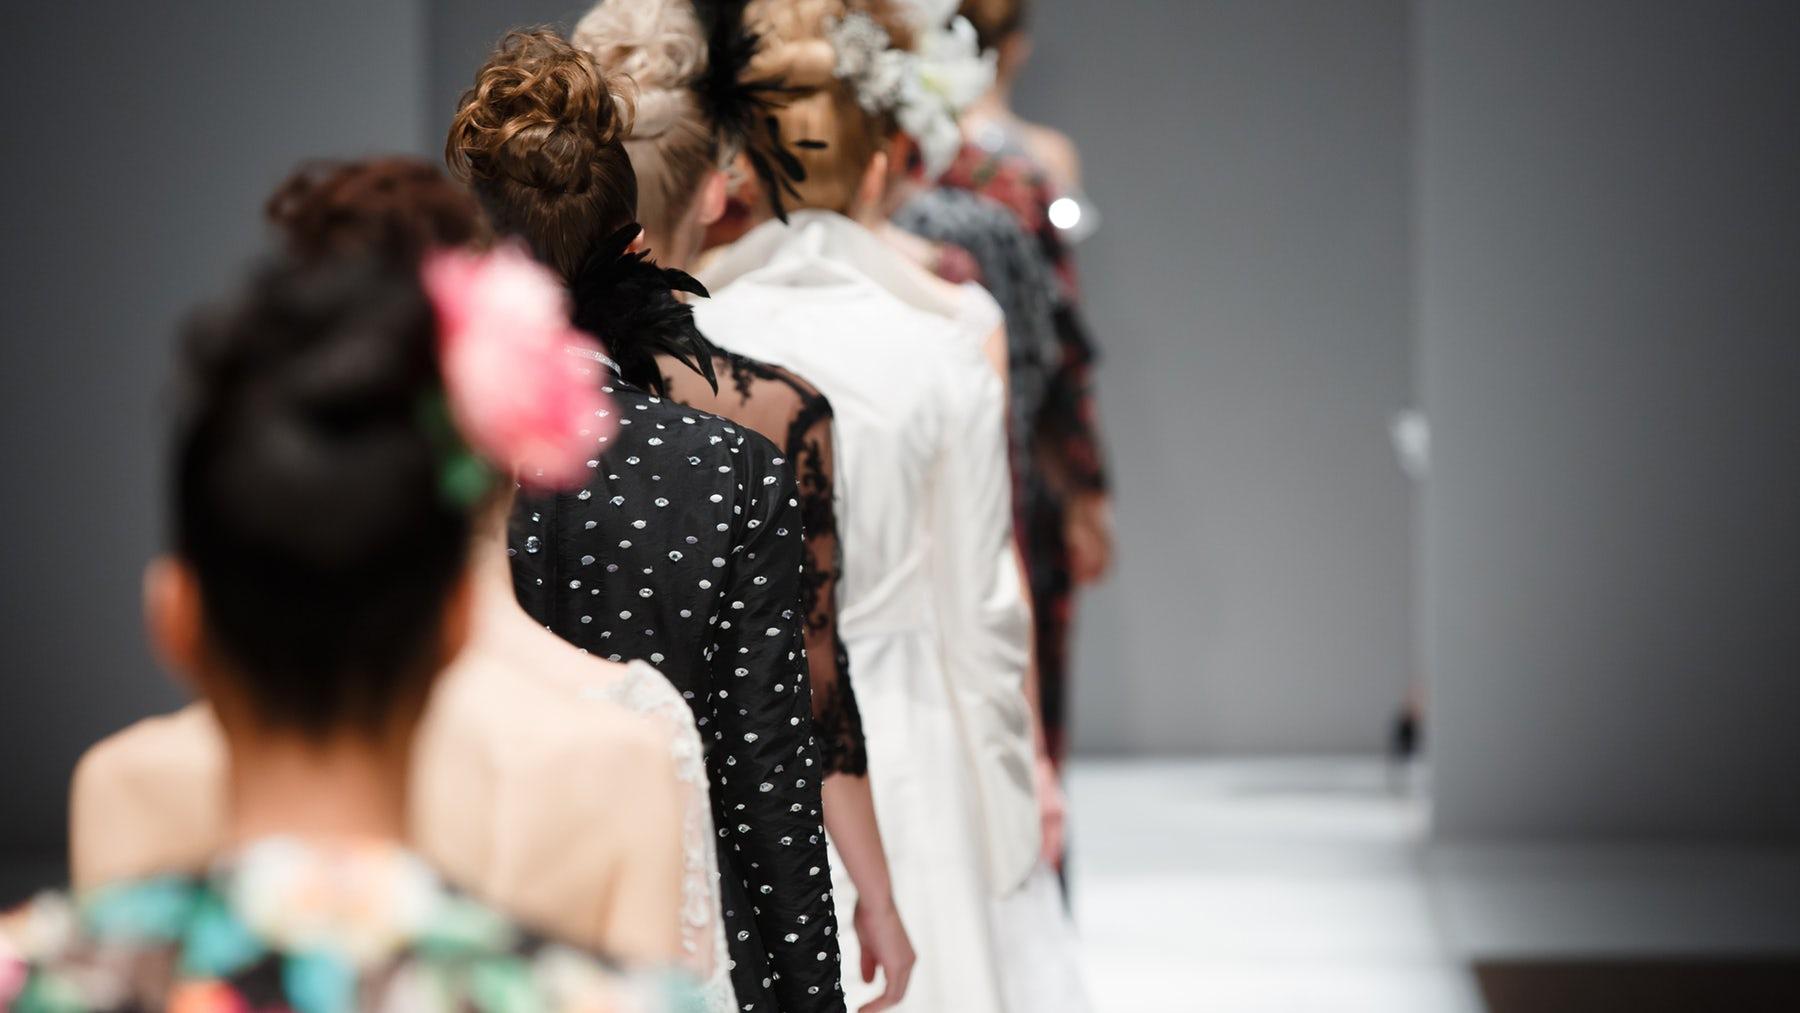 Fashion show during New York Fashion Week | Source: Shutterstock